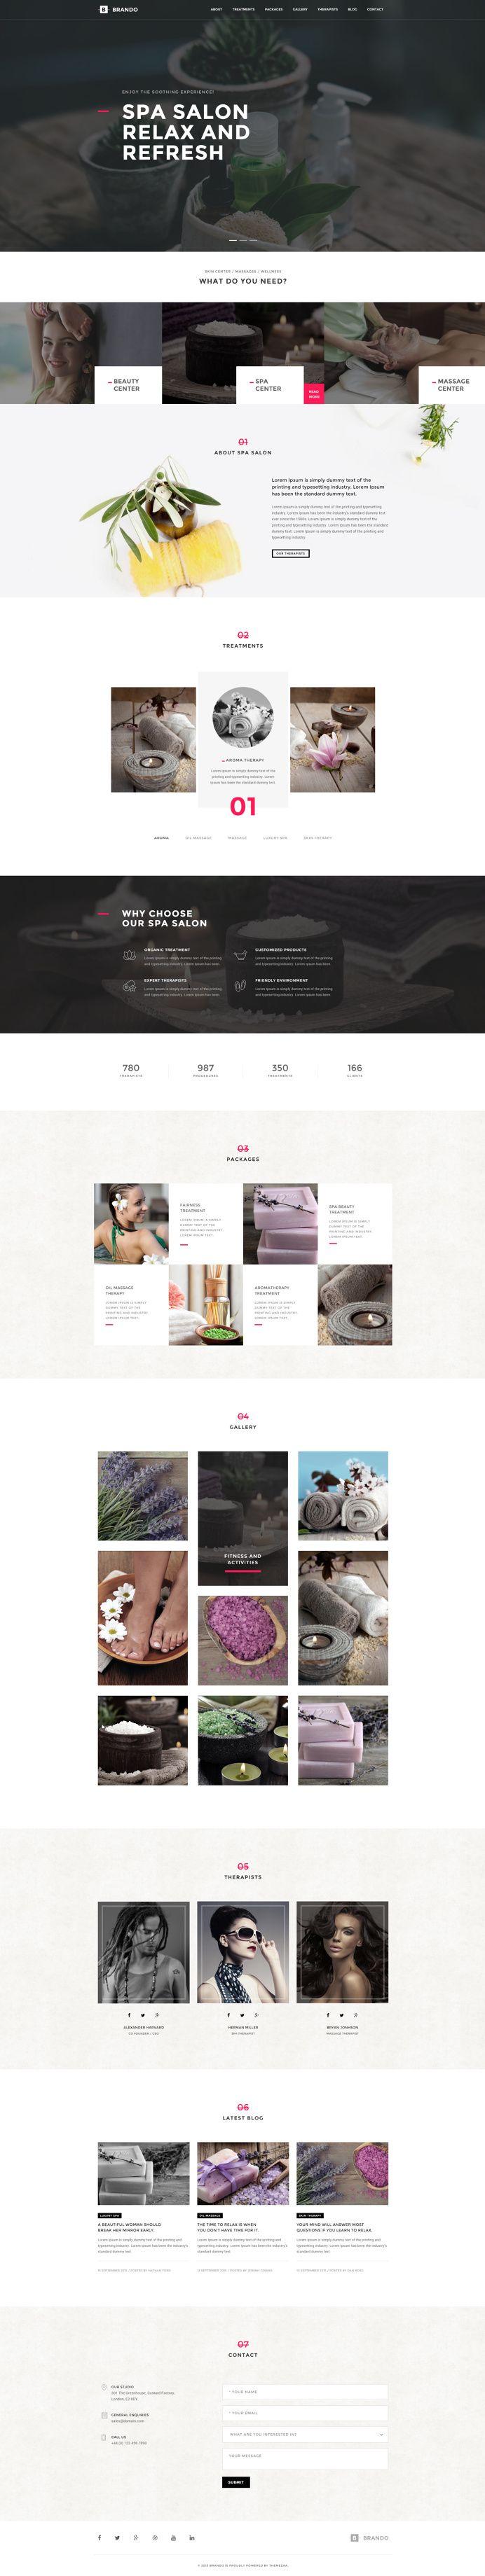 http://designspiration.net/image/45196273968562/